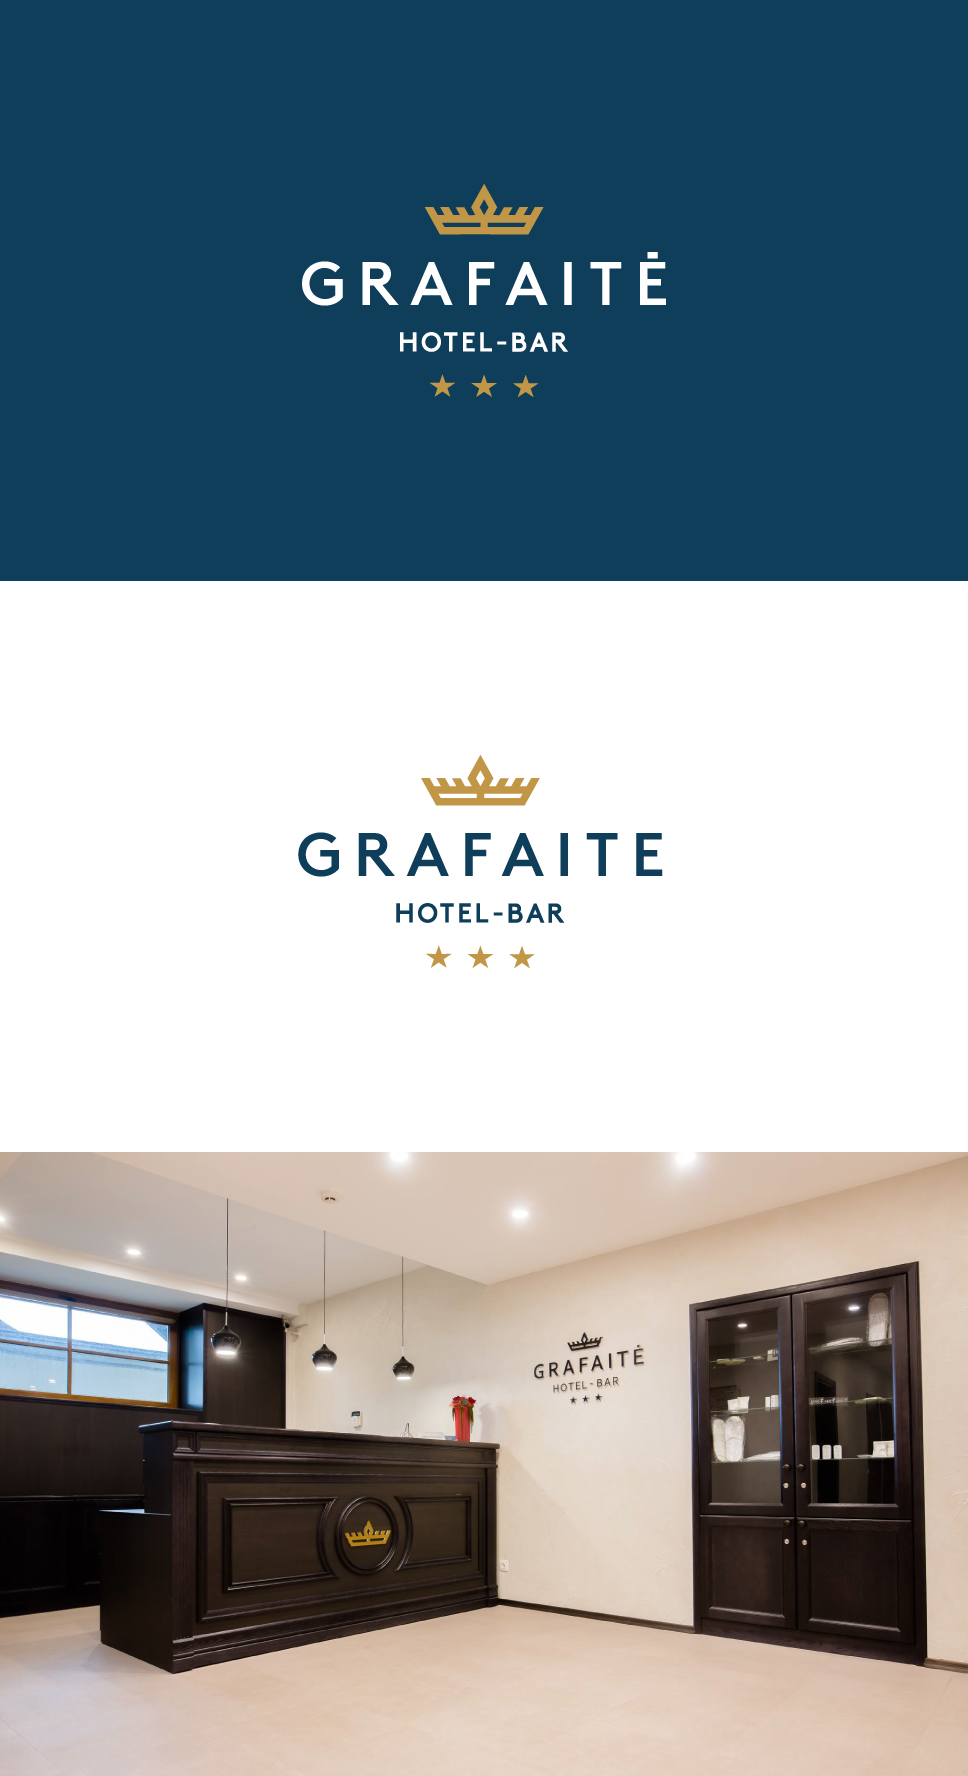 modern crown logo design for a hotel bar